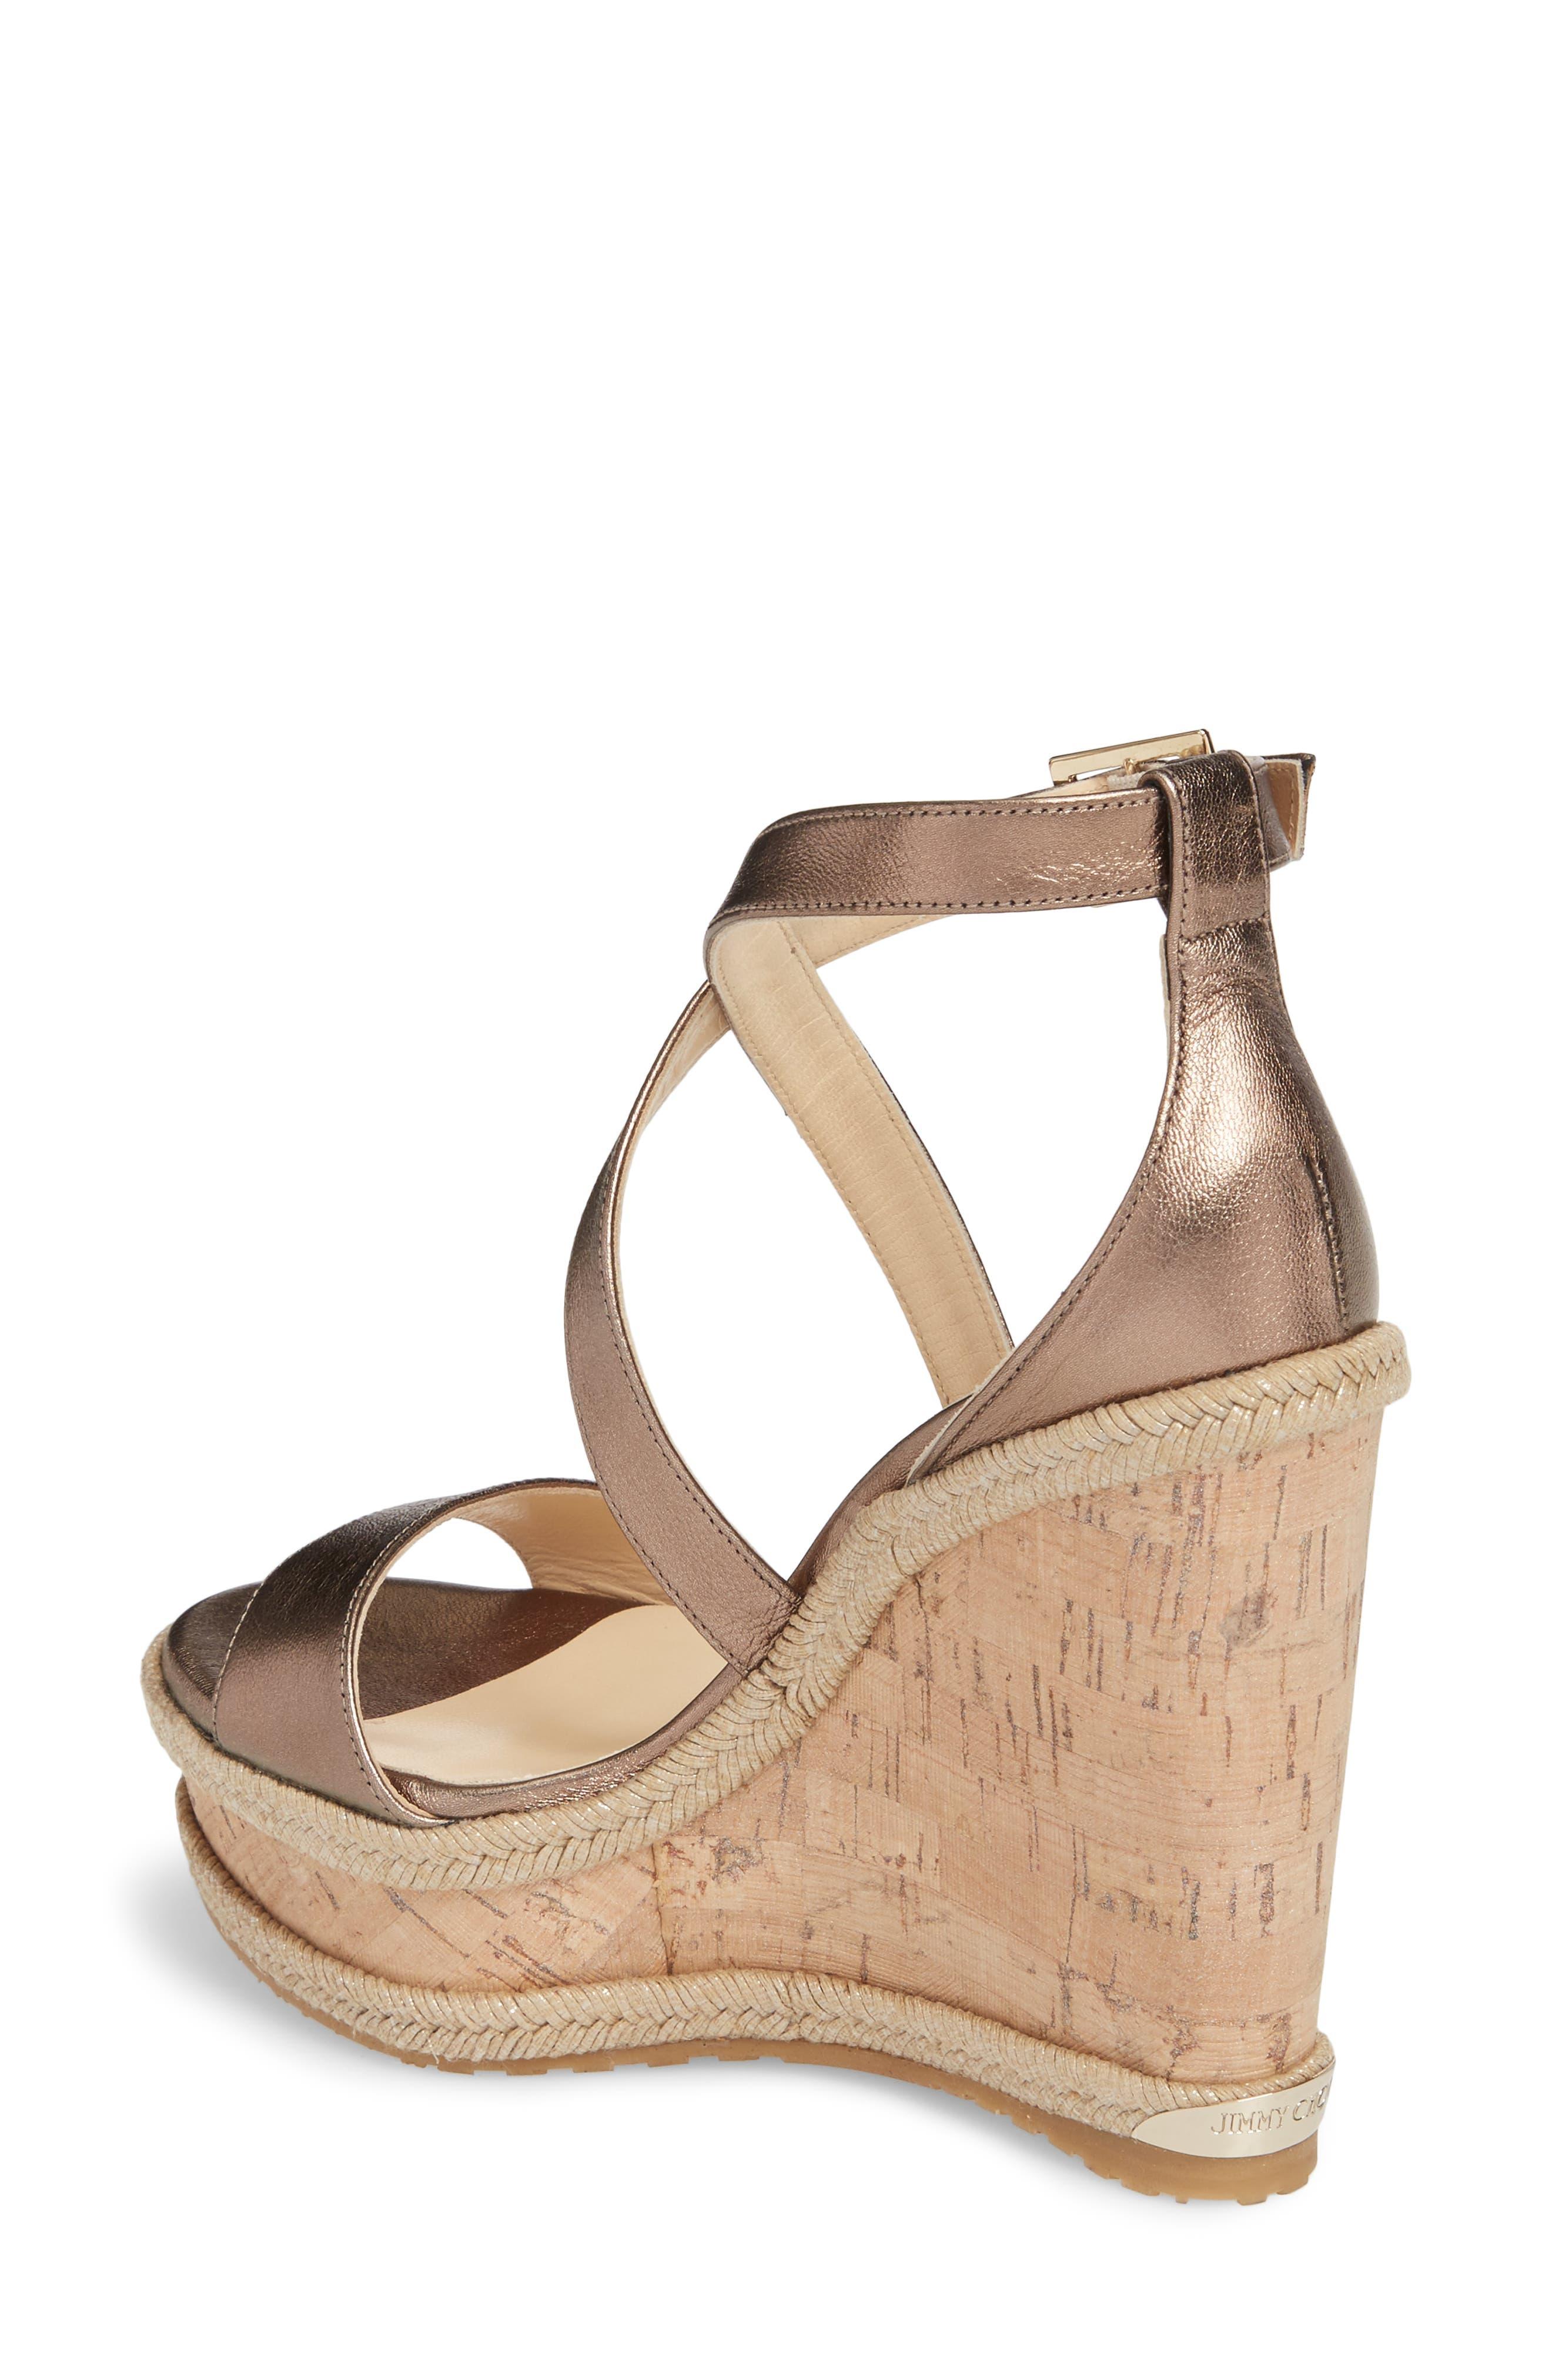 Portia Wedge Platform Sandal,                             Alternate thumbnail 2, color,                             710